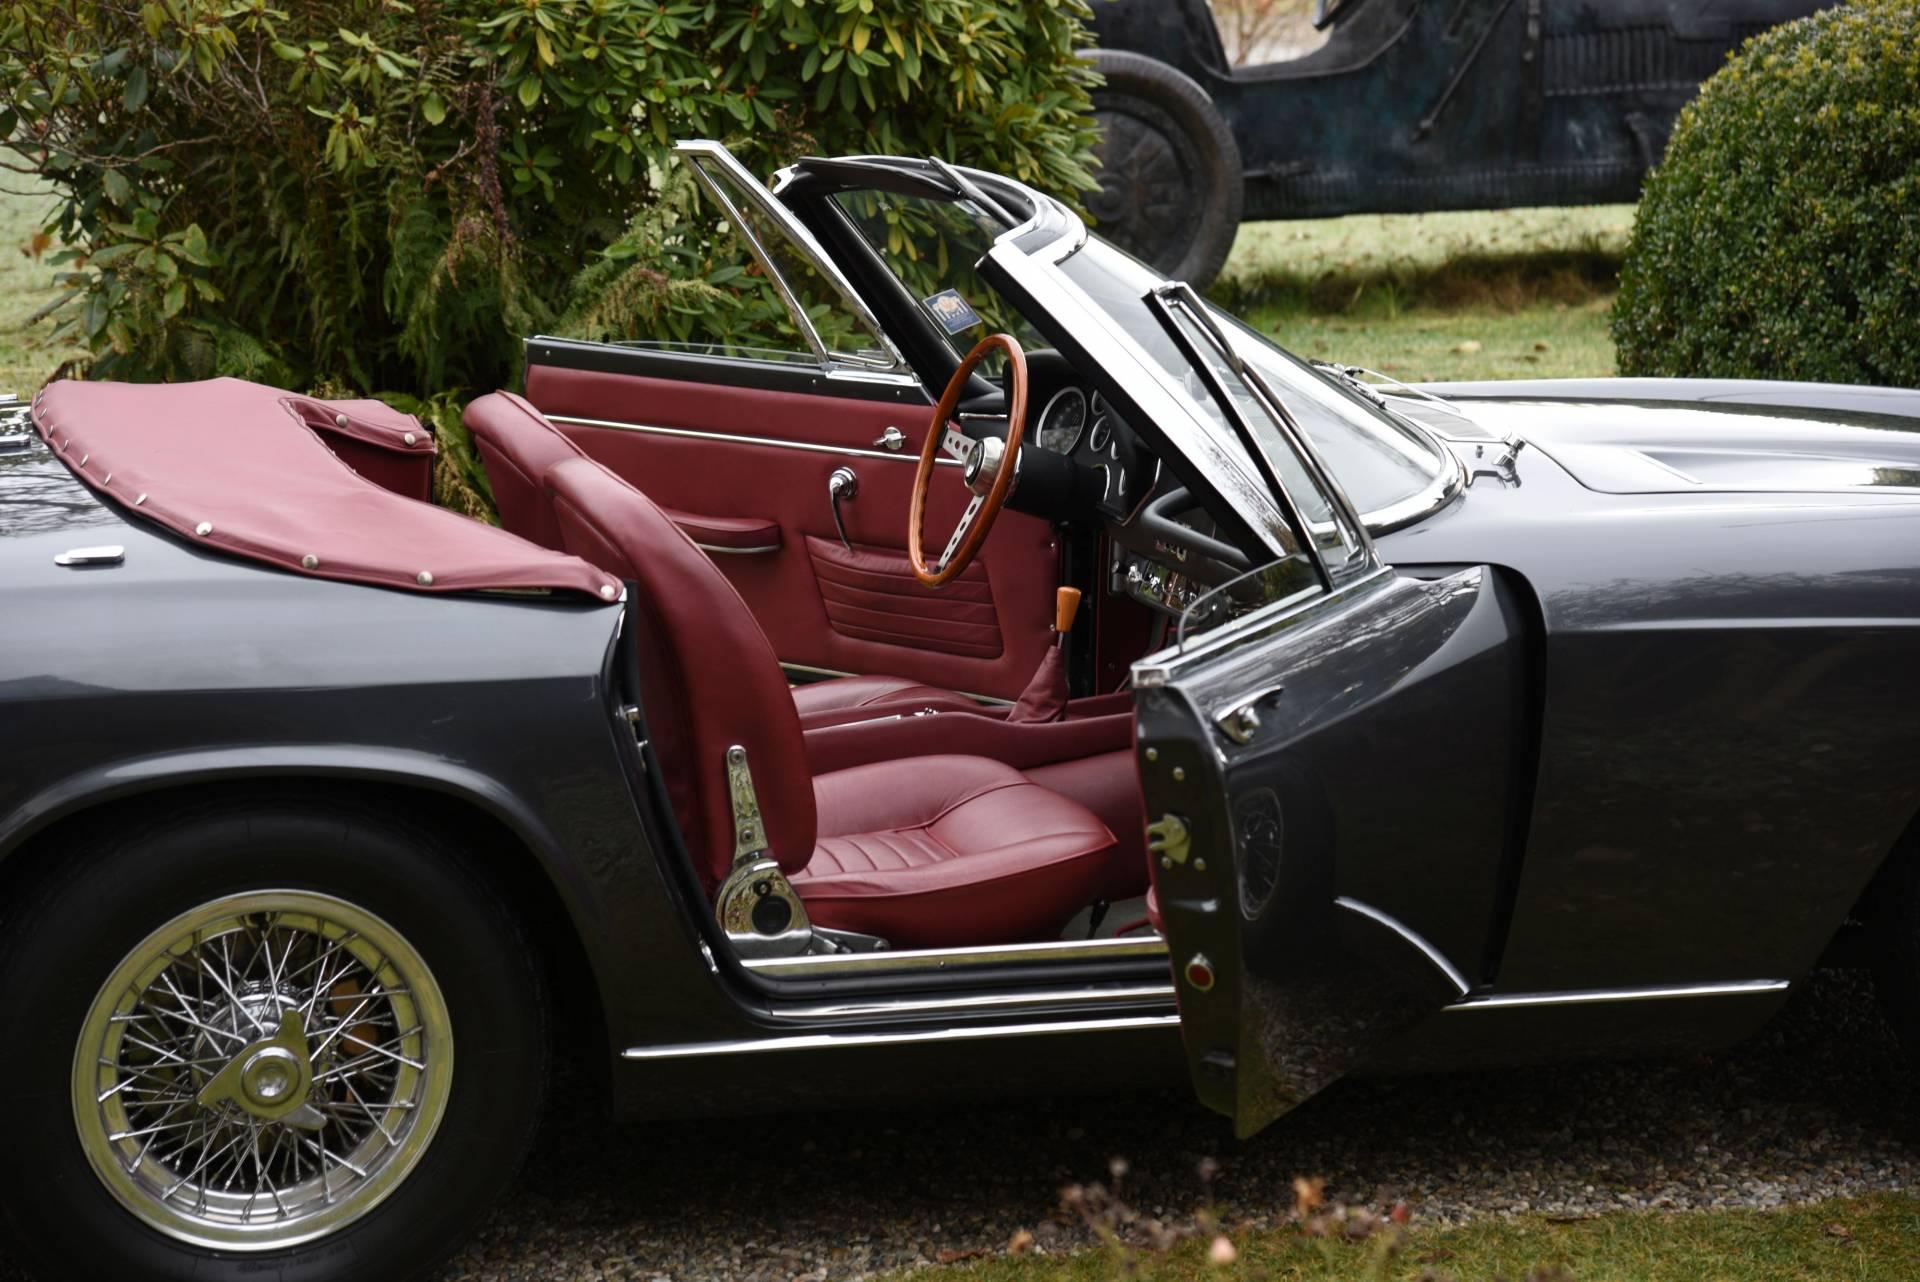 Maserati Mistral 4000 Spyder (1970) kaufen - Classic Trader